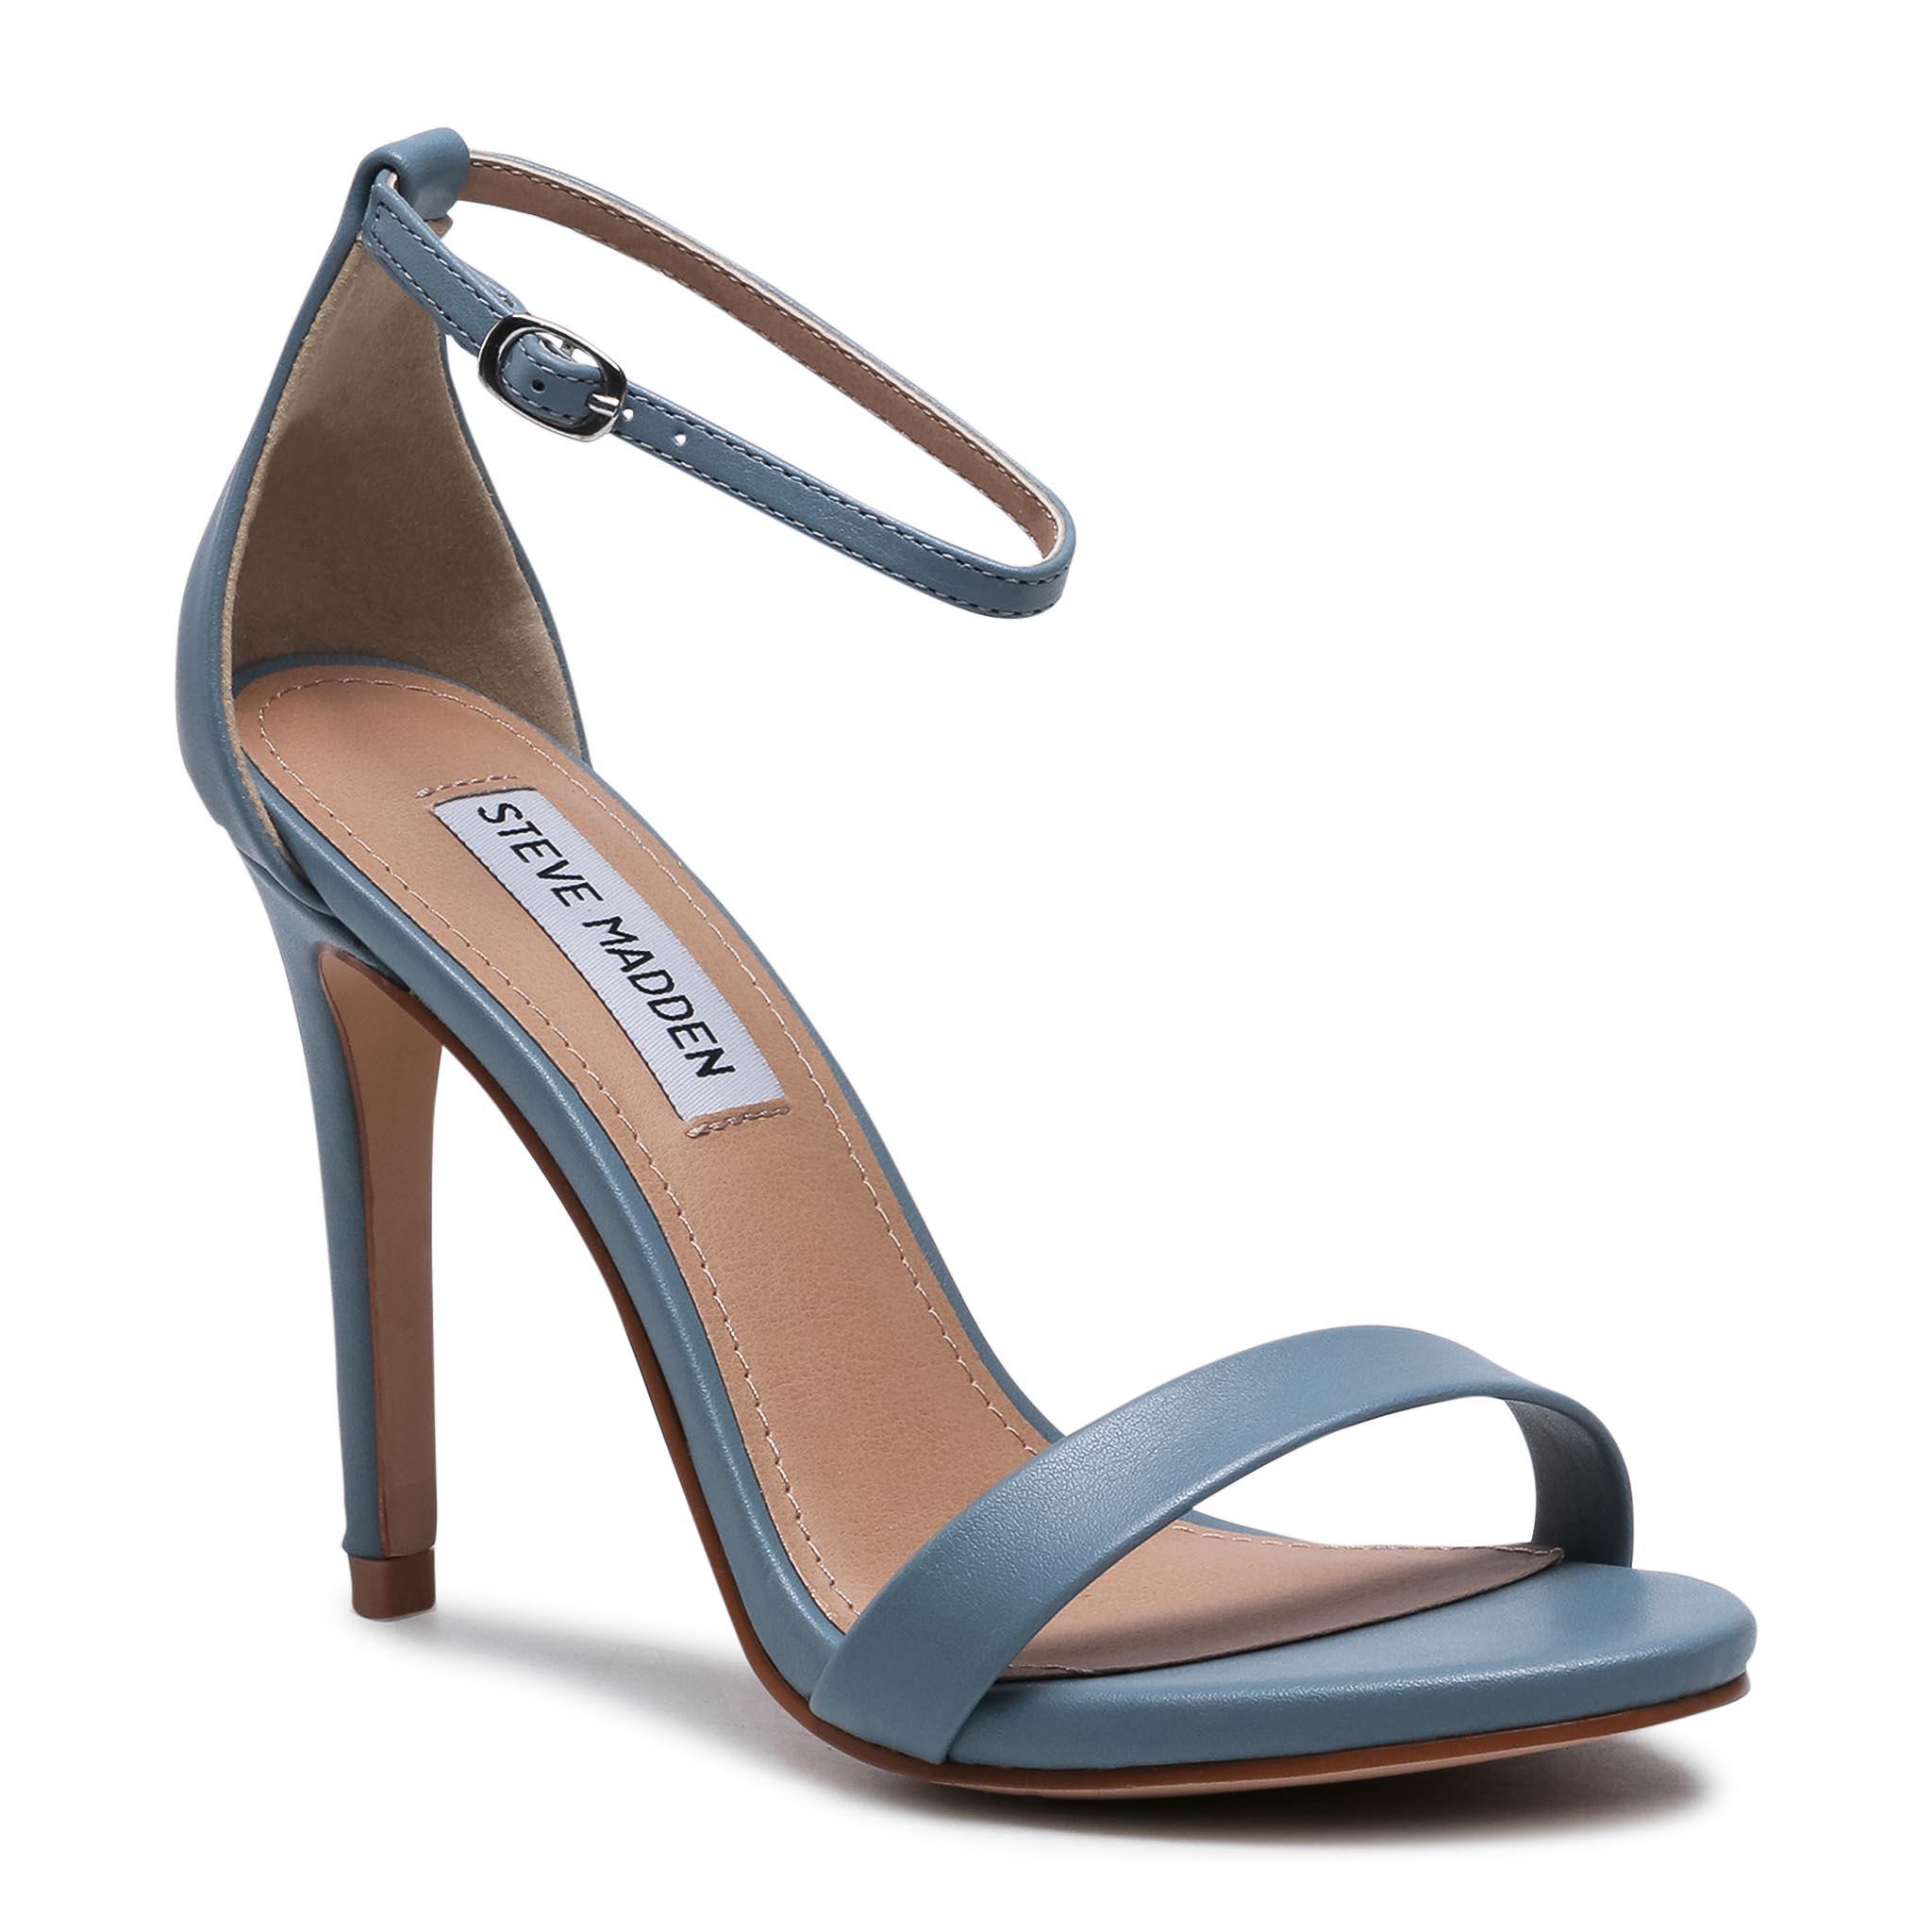 Image of High Heels STEVE MADDEN - Stecy SM11000010-02002-47C Slate Blue